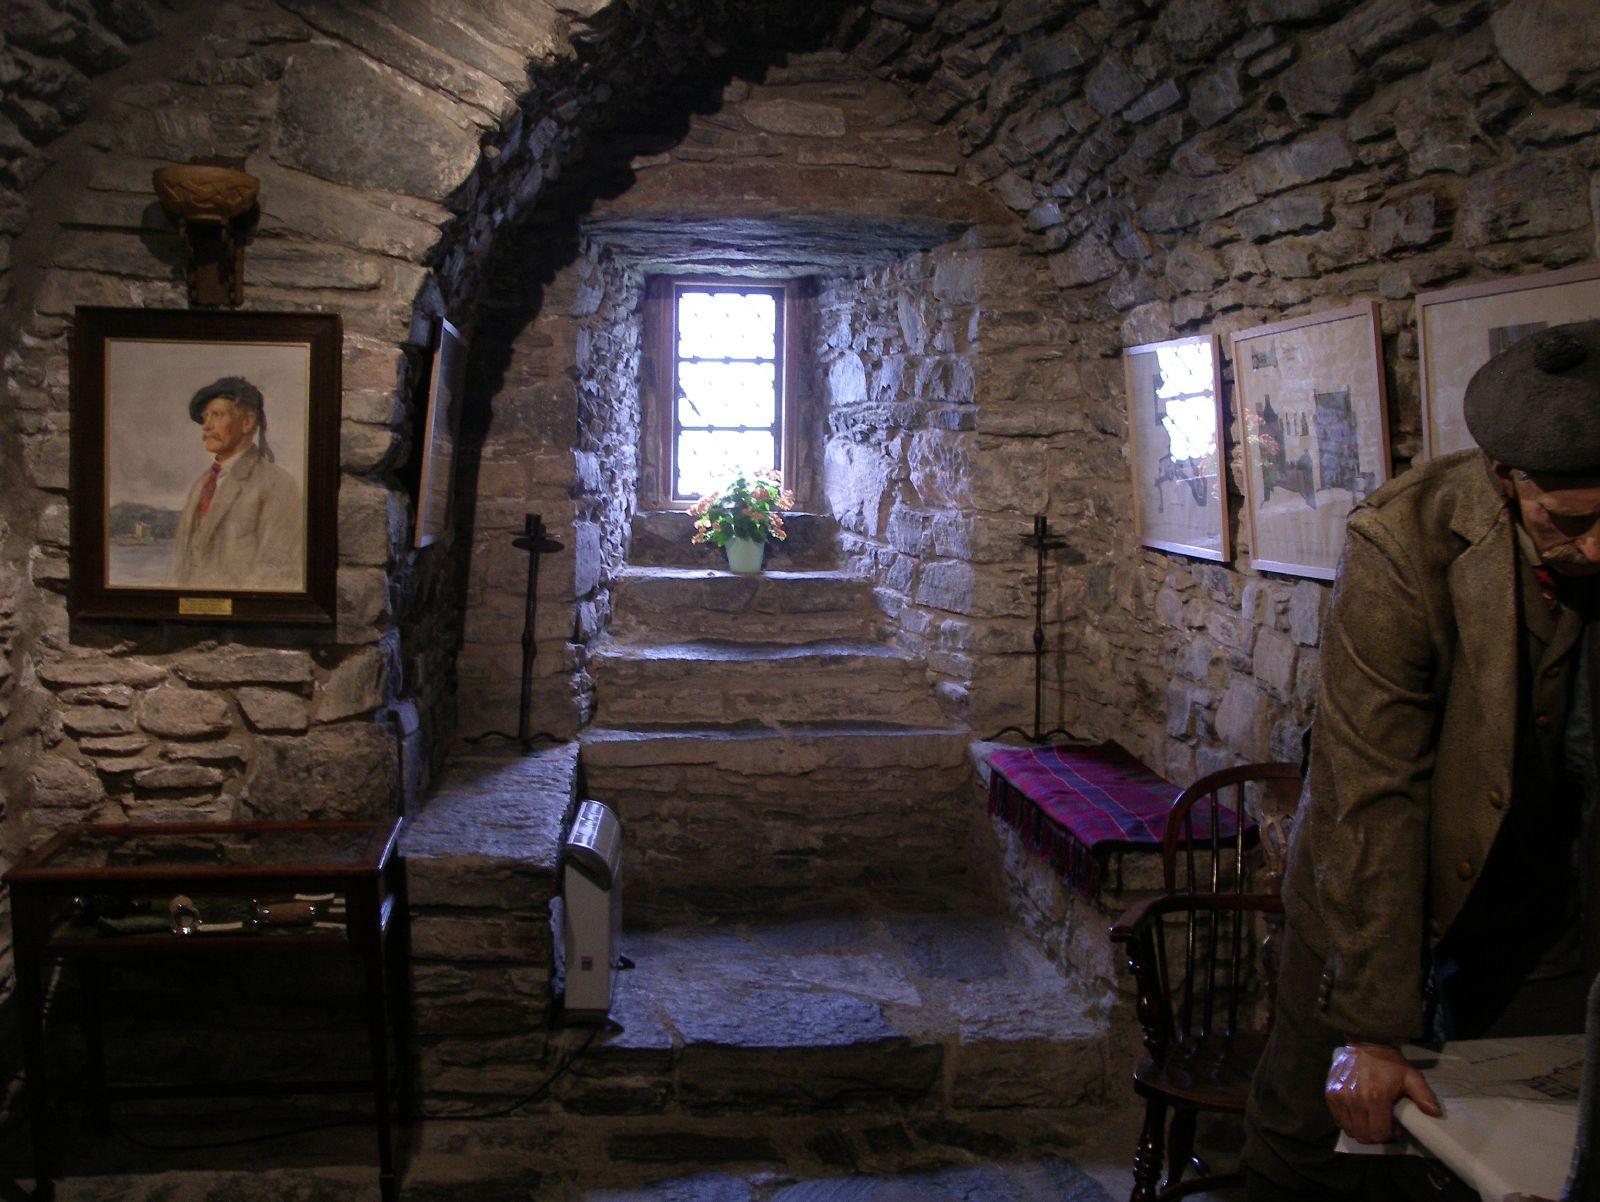 scottish ghosts - clan rollo online - scotland's culture